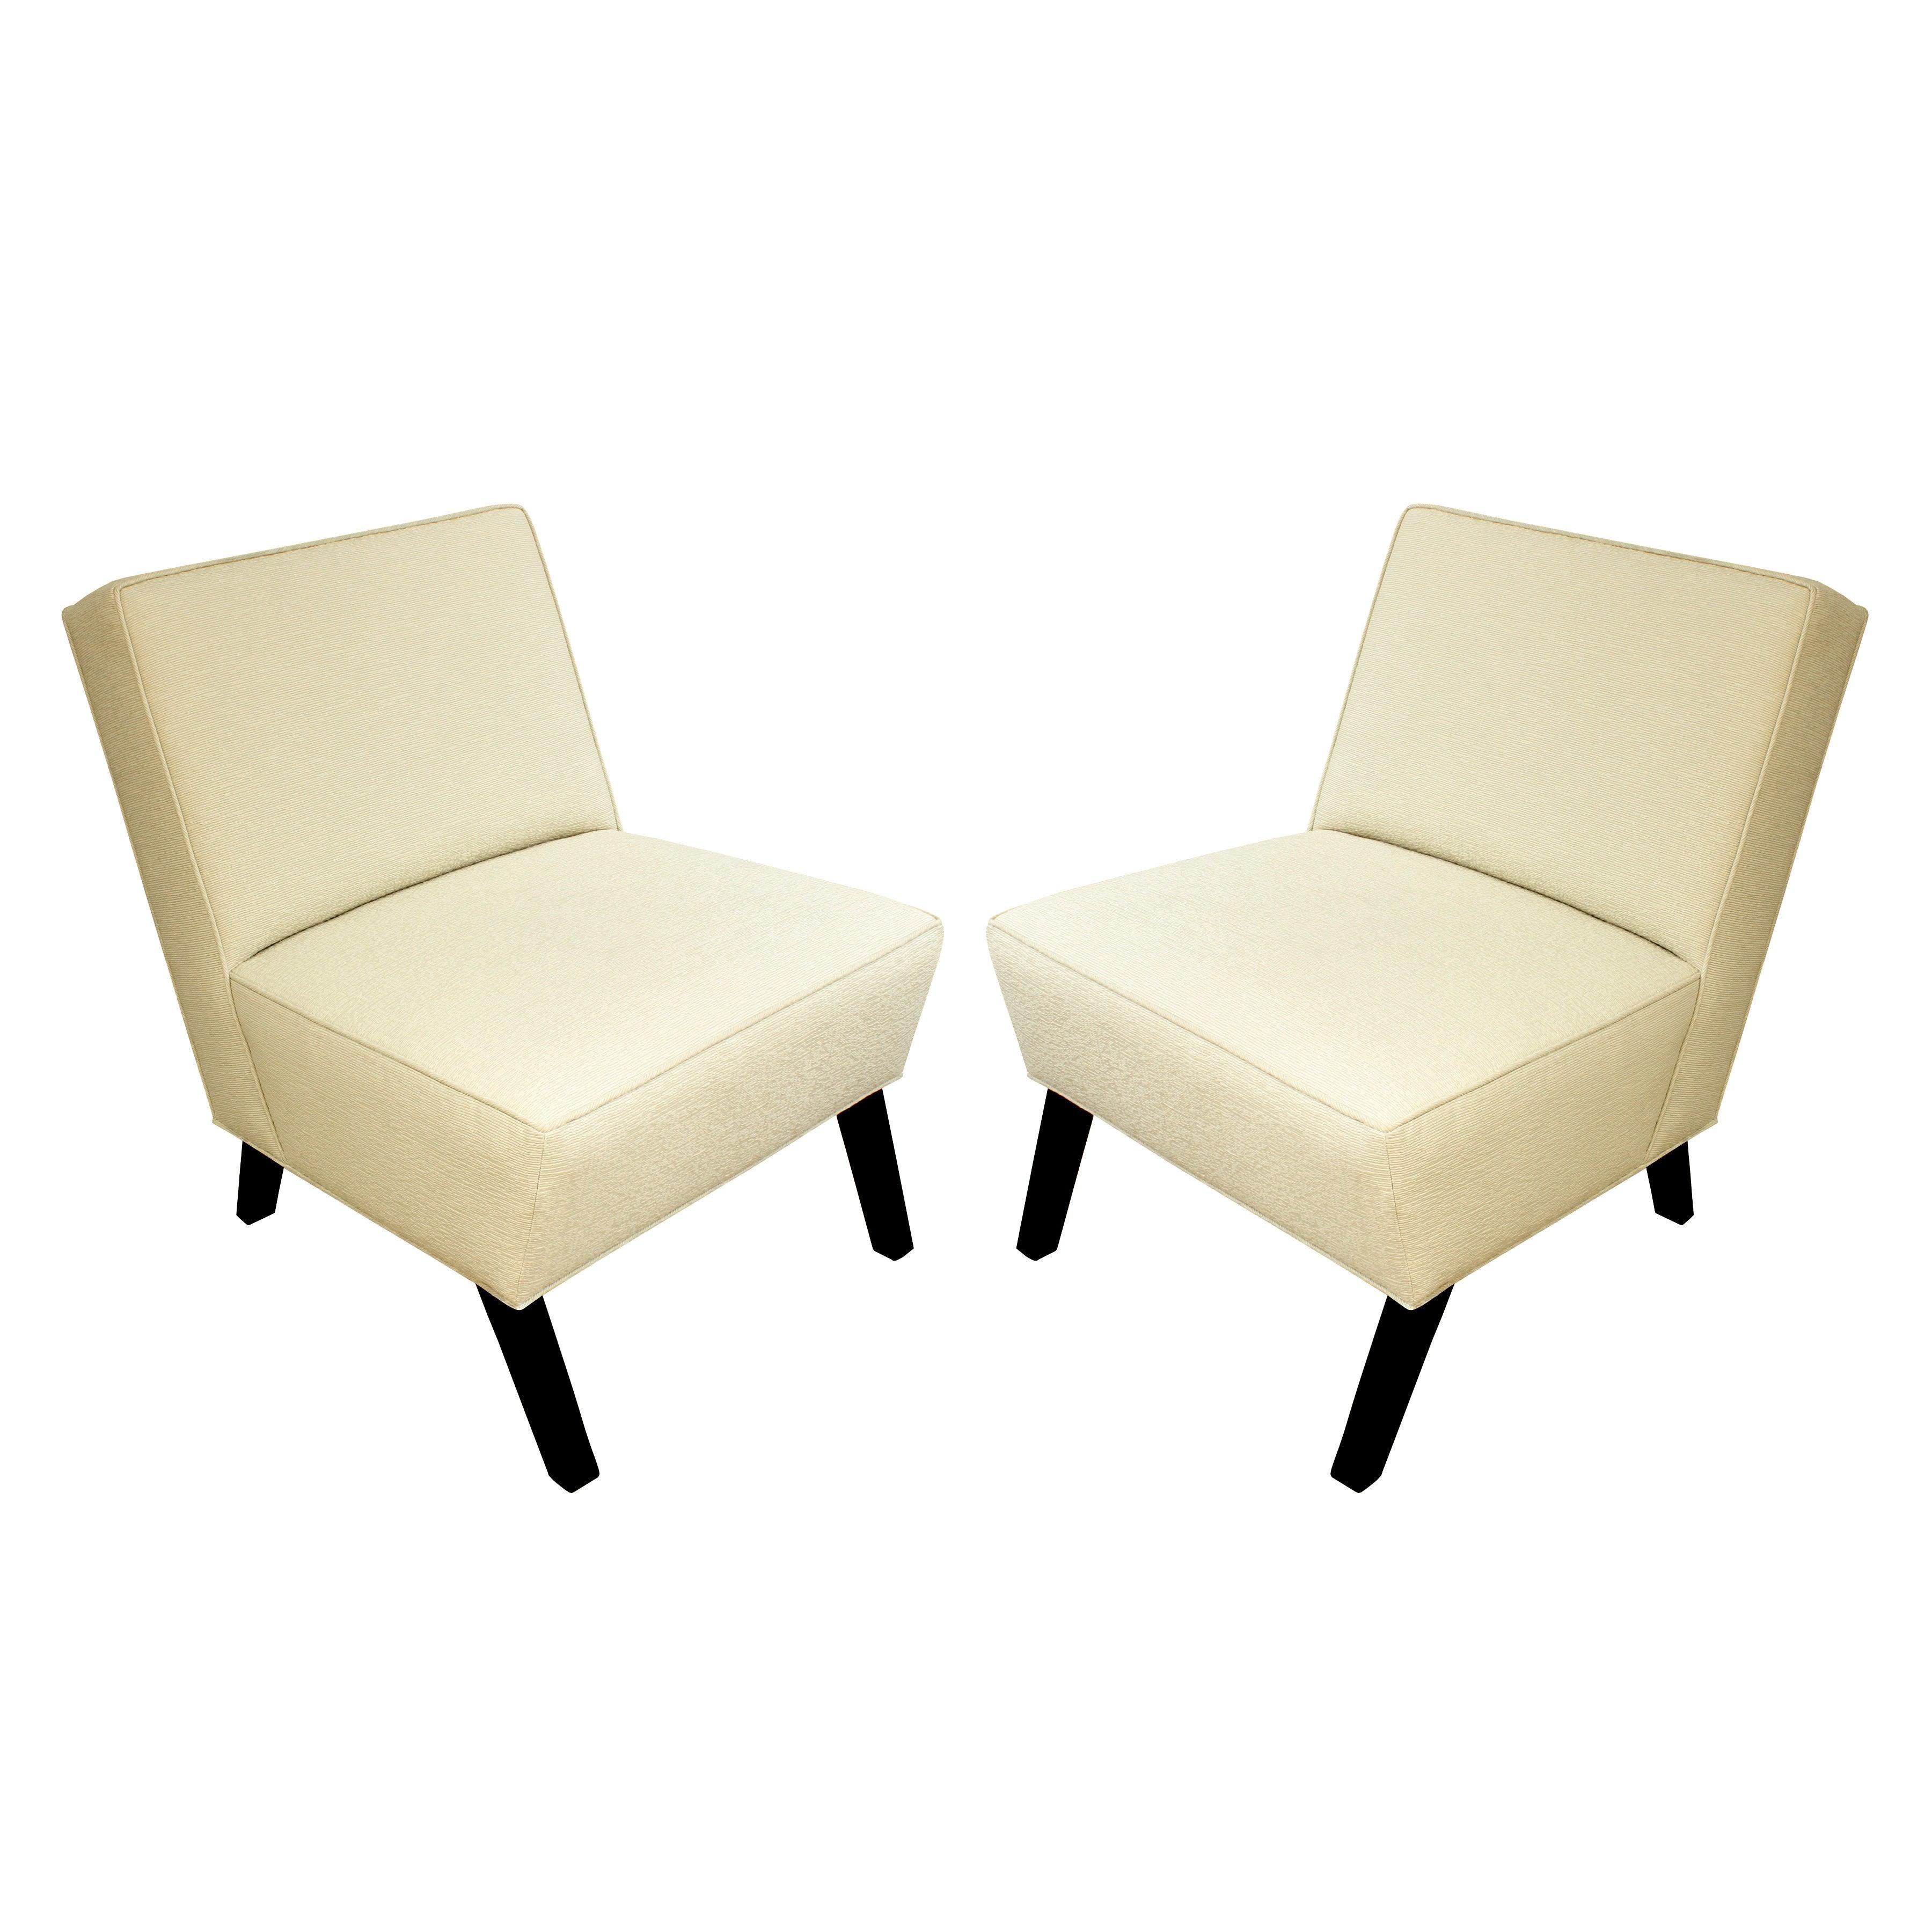 Pair of Elegant Slipper Chairs, 1940s